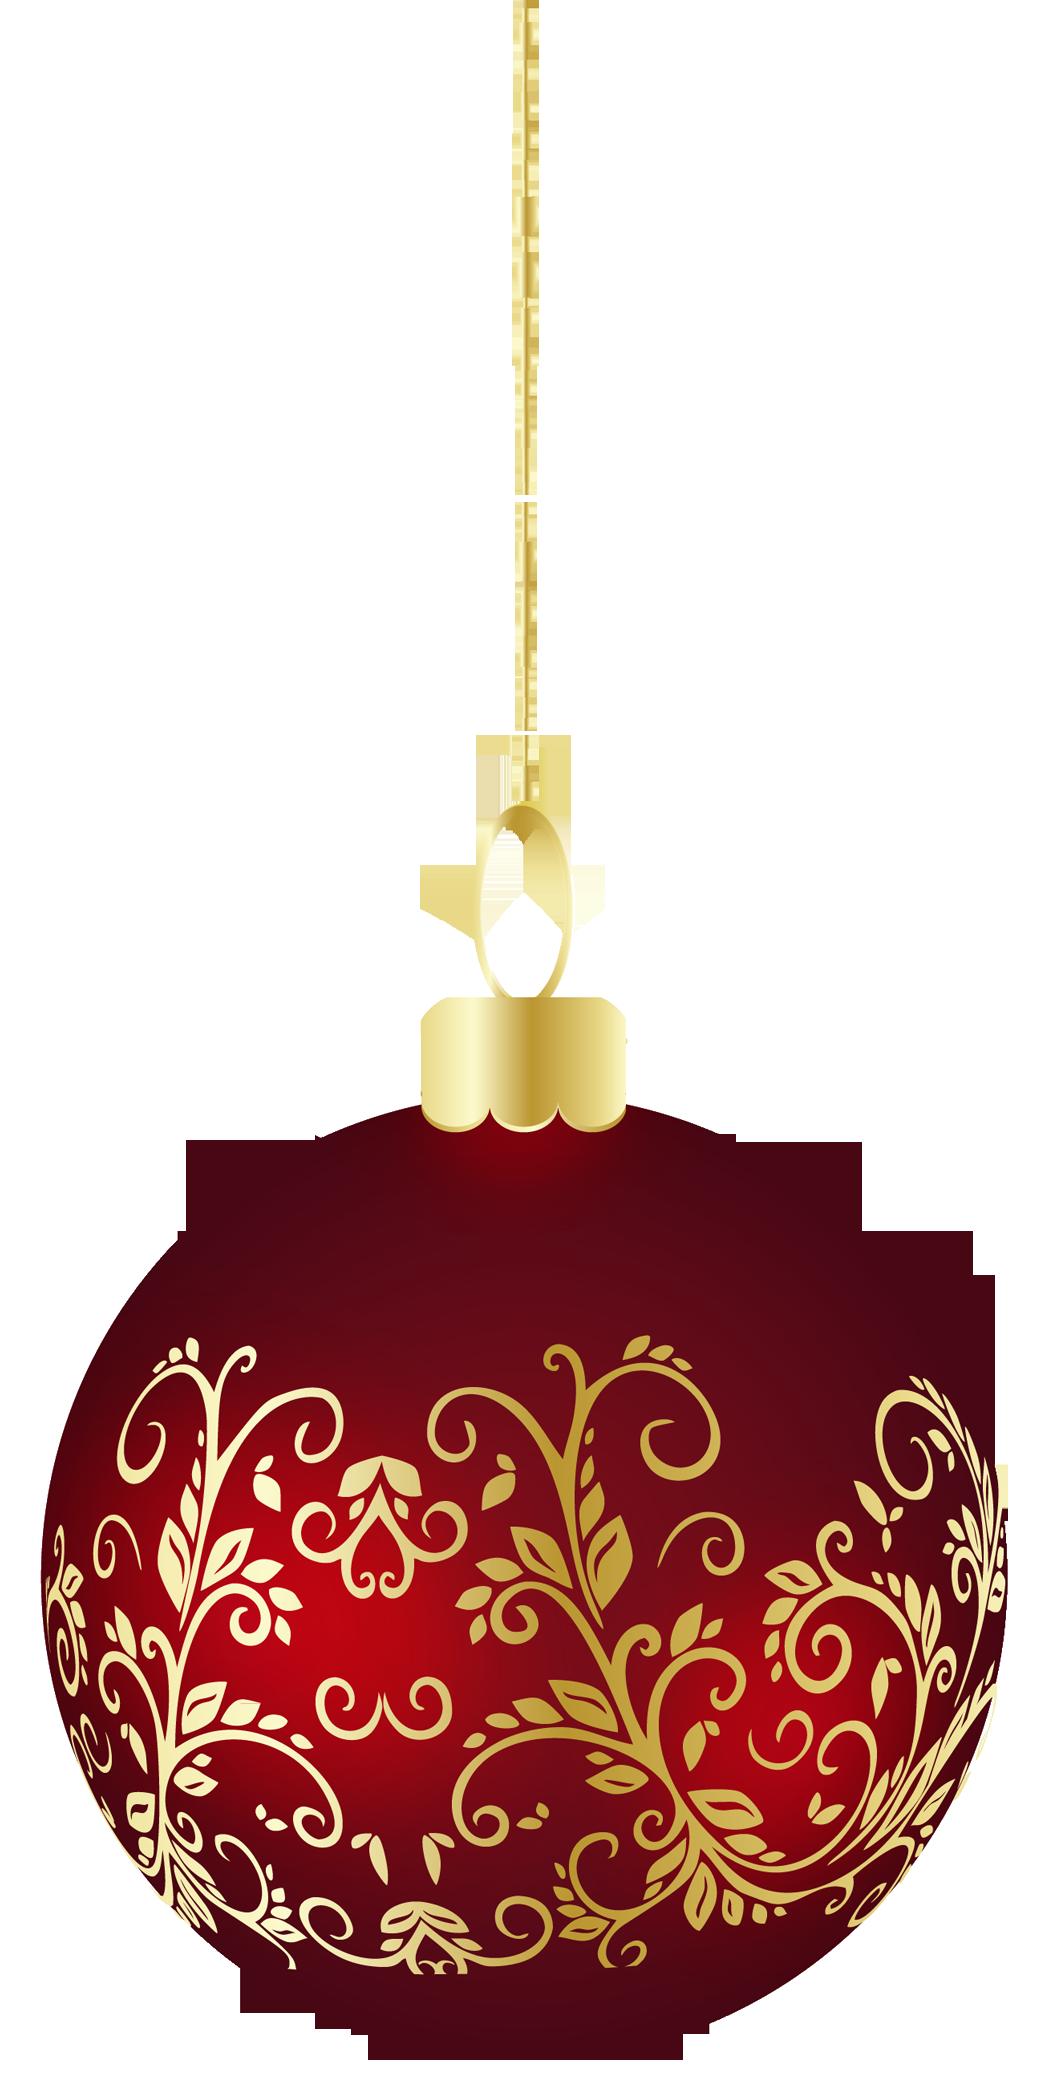 Ornament clipart elegant. Large transparent christmas ball